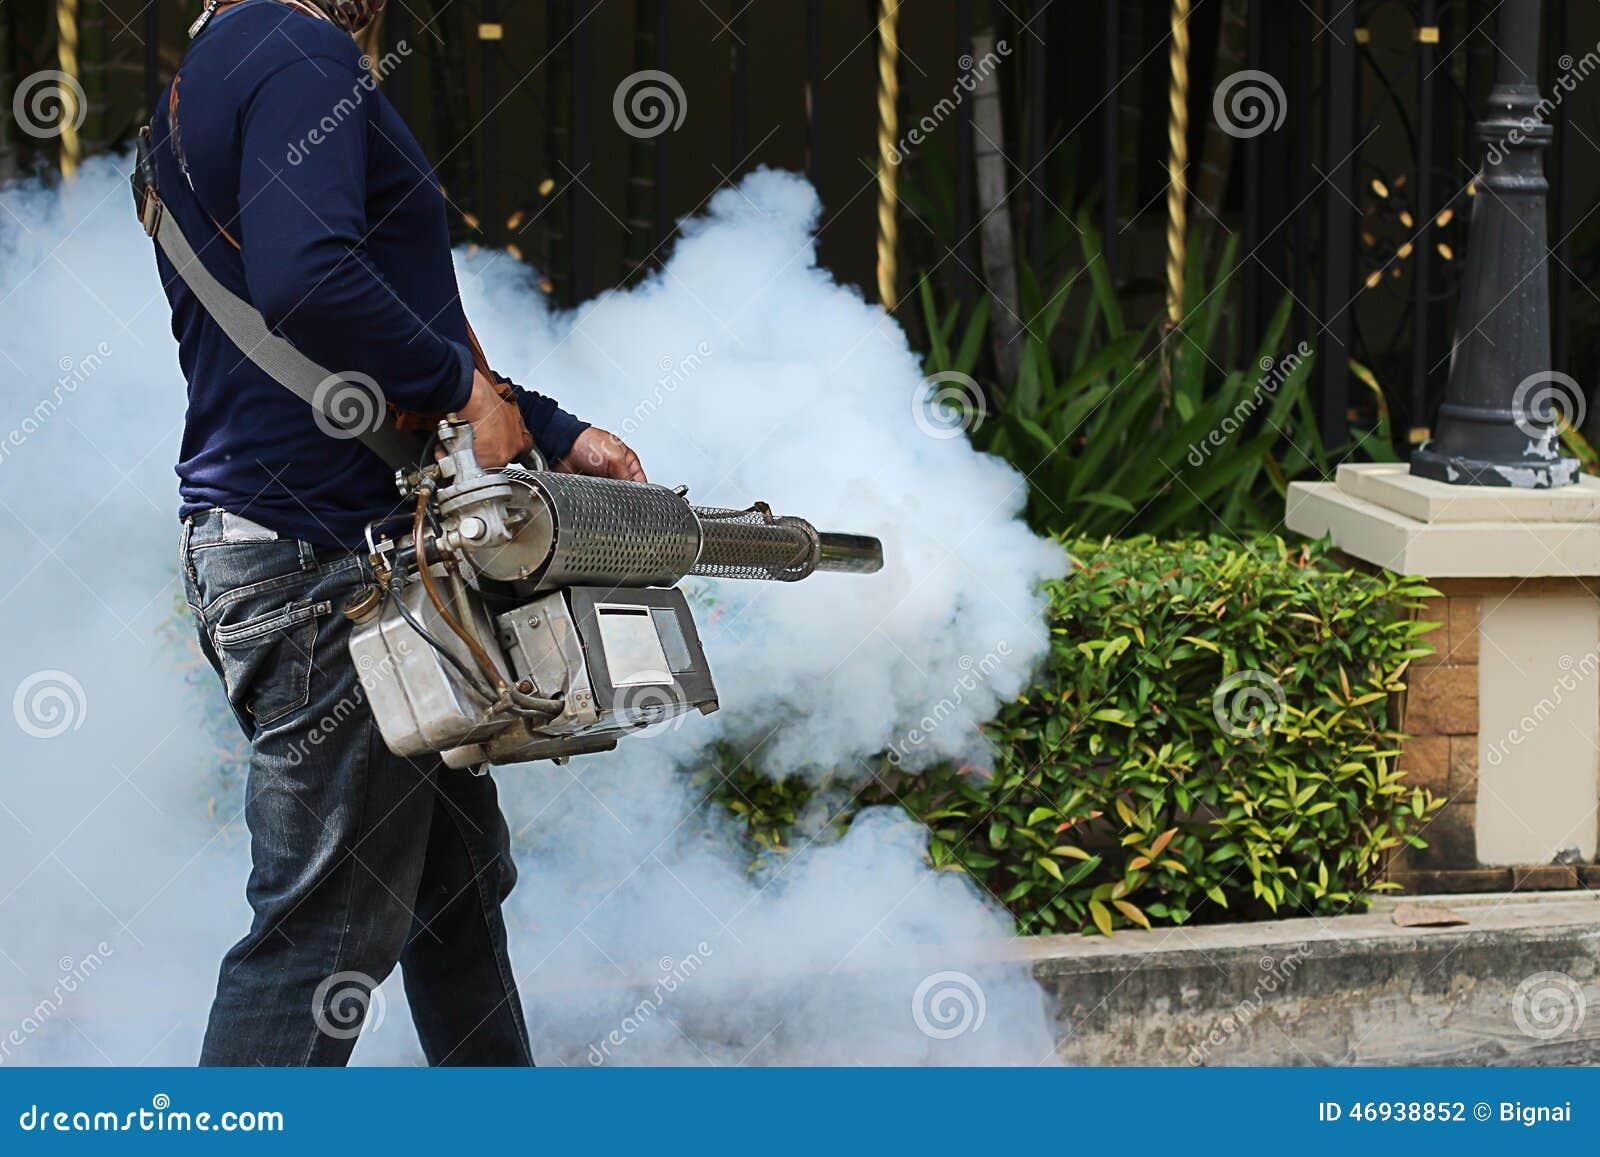 Enevoar-se para impedir a febre de dengue